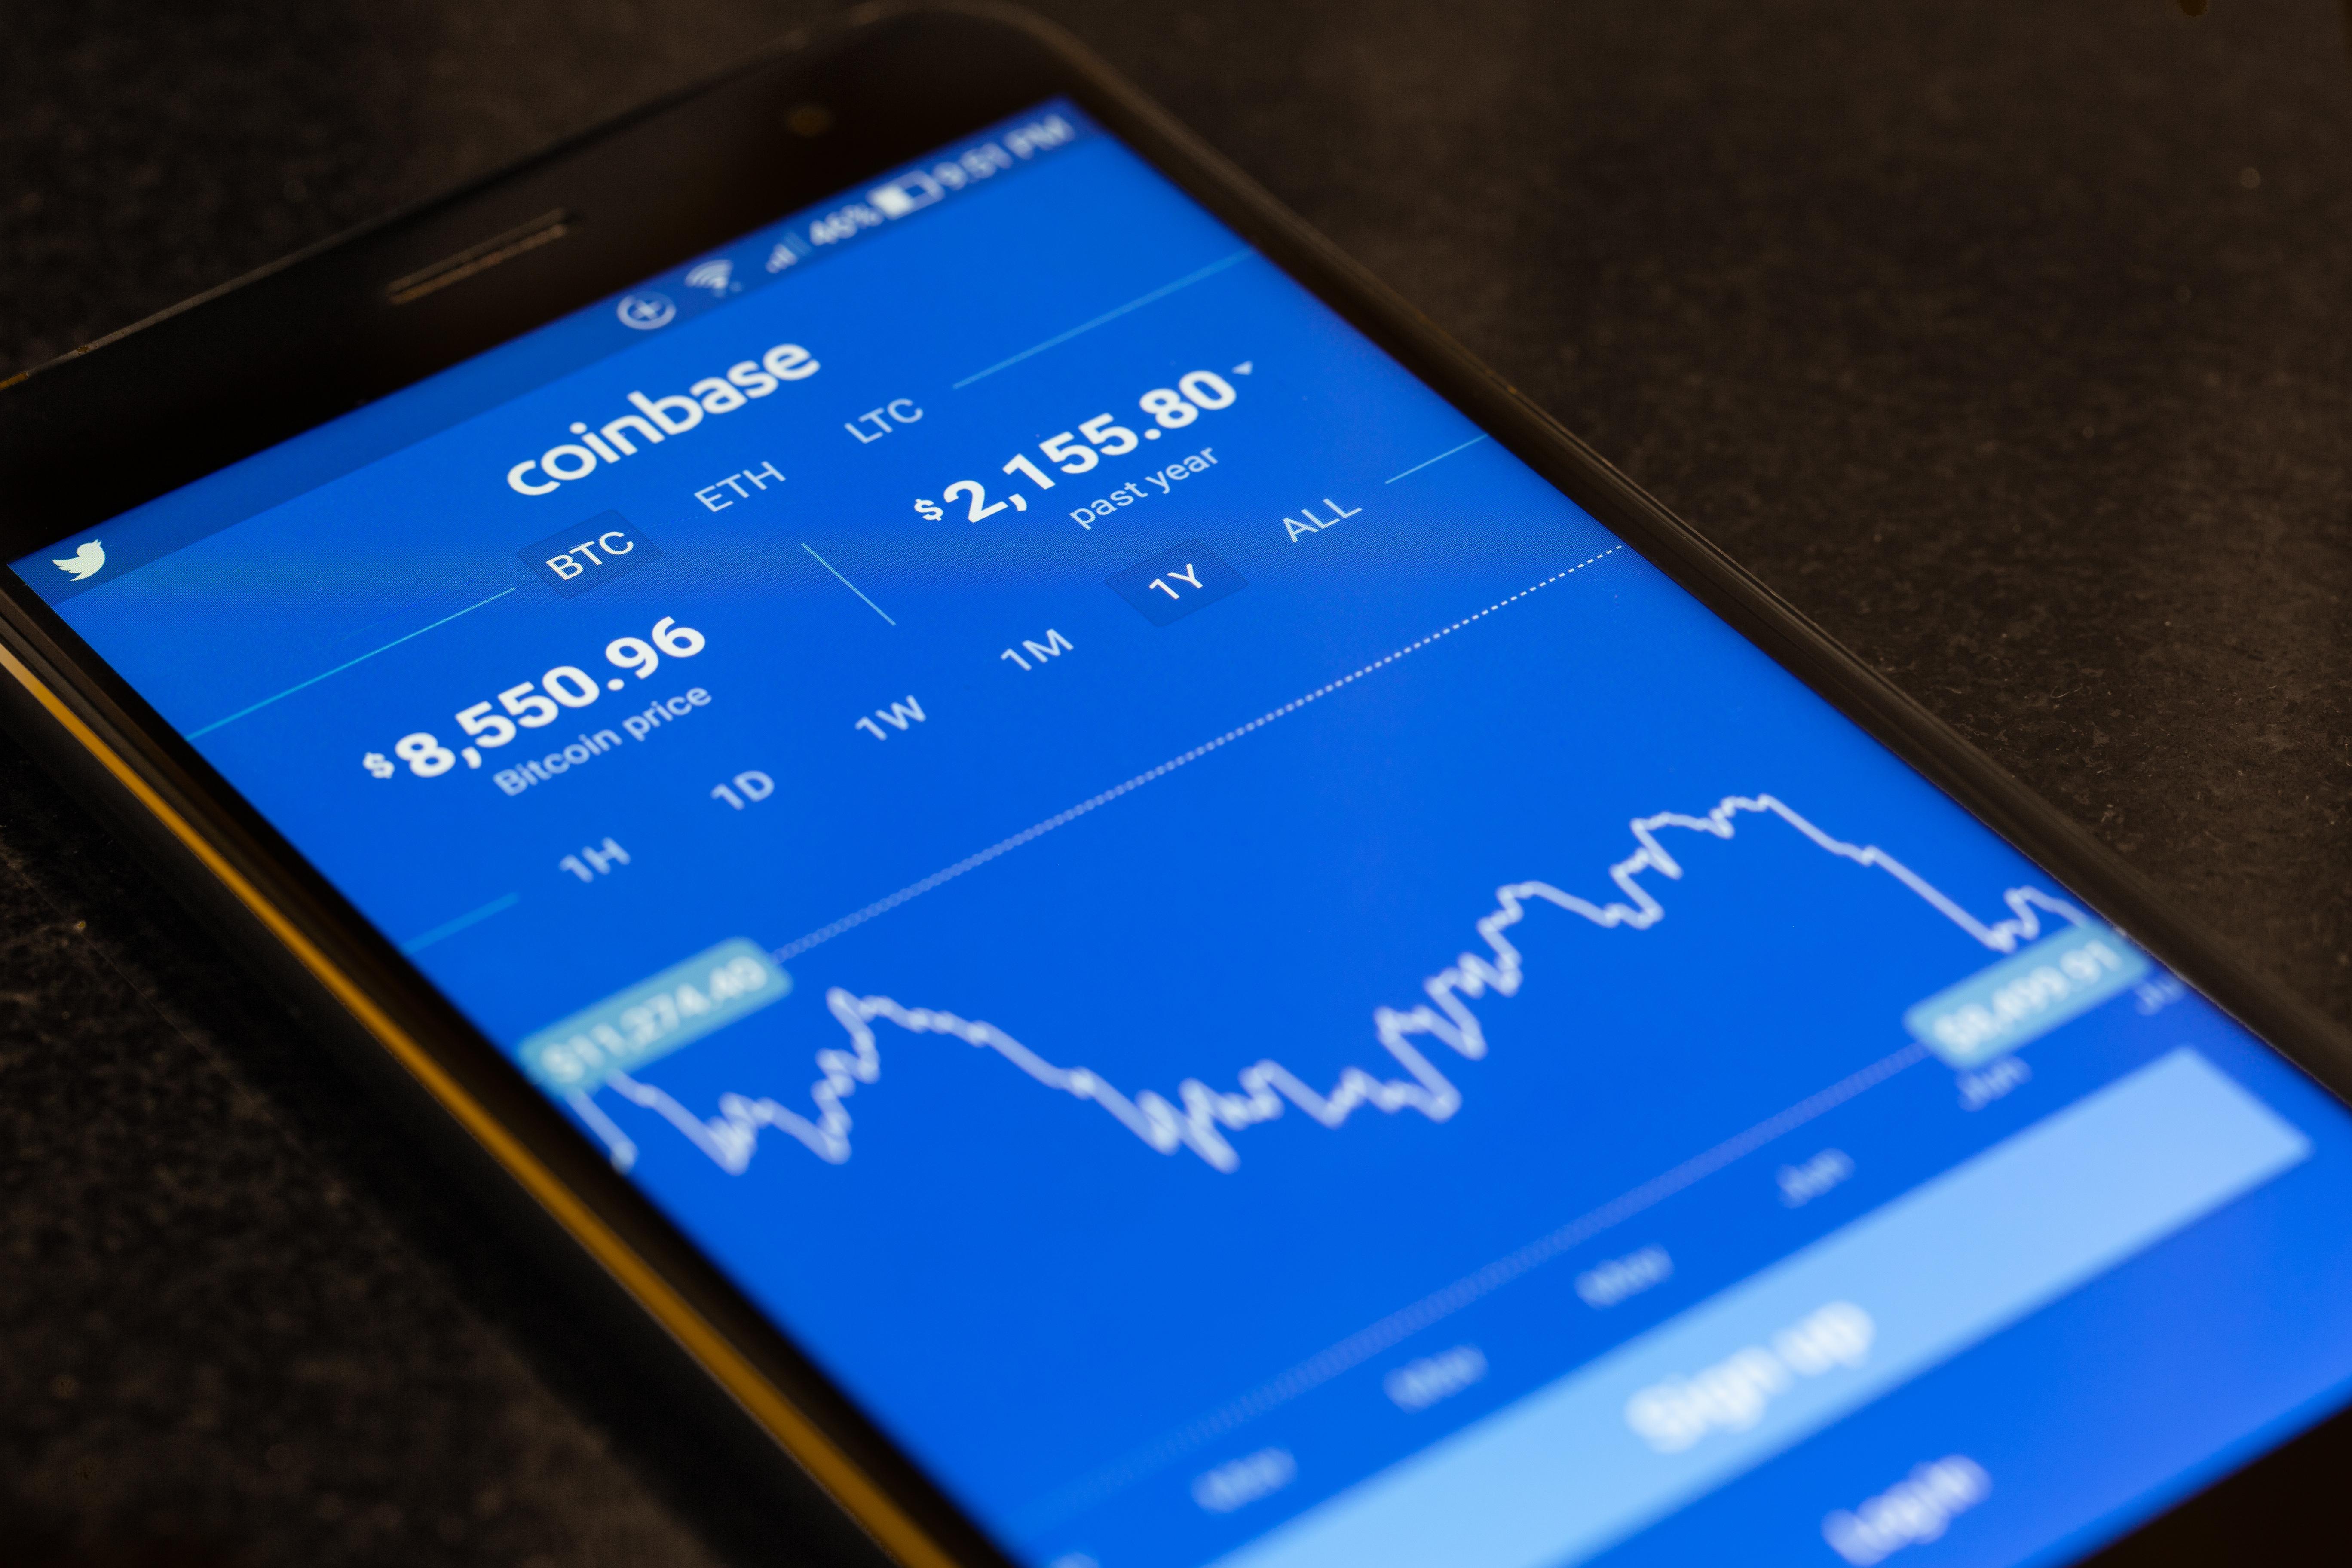 Coinbase Bows to SEC's Demands as It Shelves Lending Product